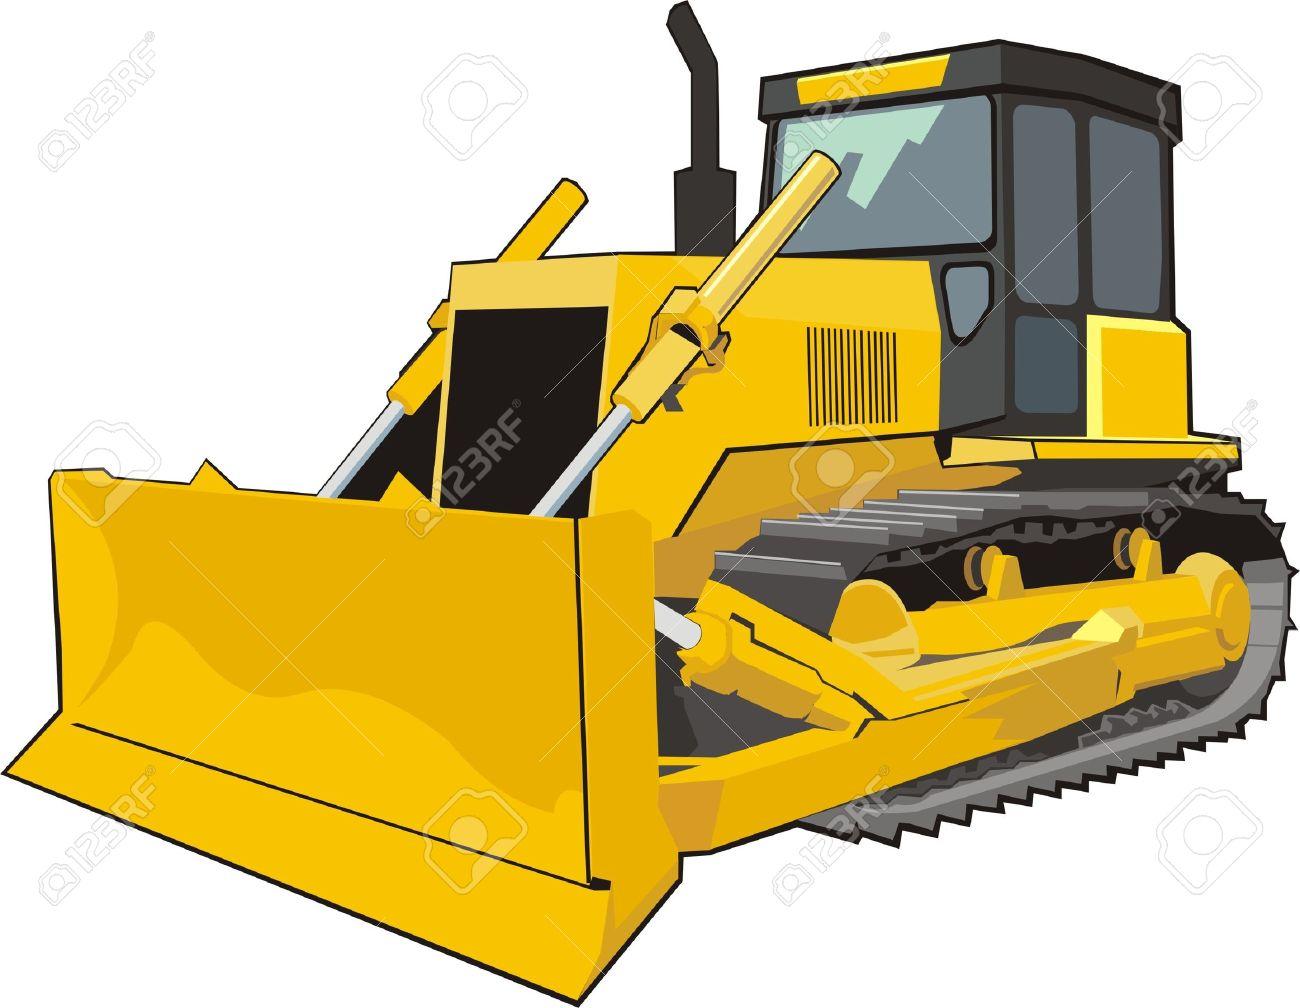 the latest 4d9e6 d9e1d yellow caterpillar building bulldozer